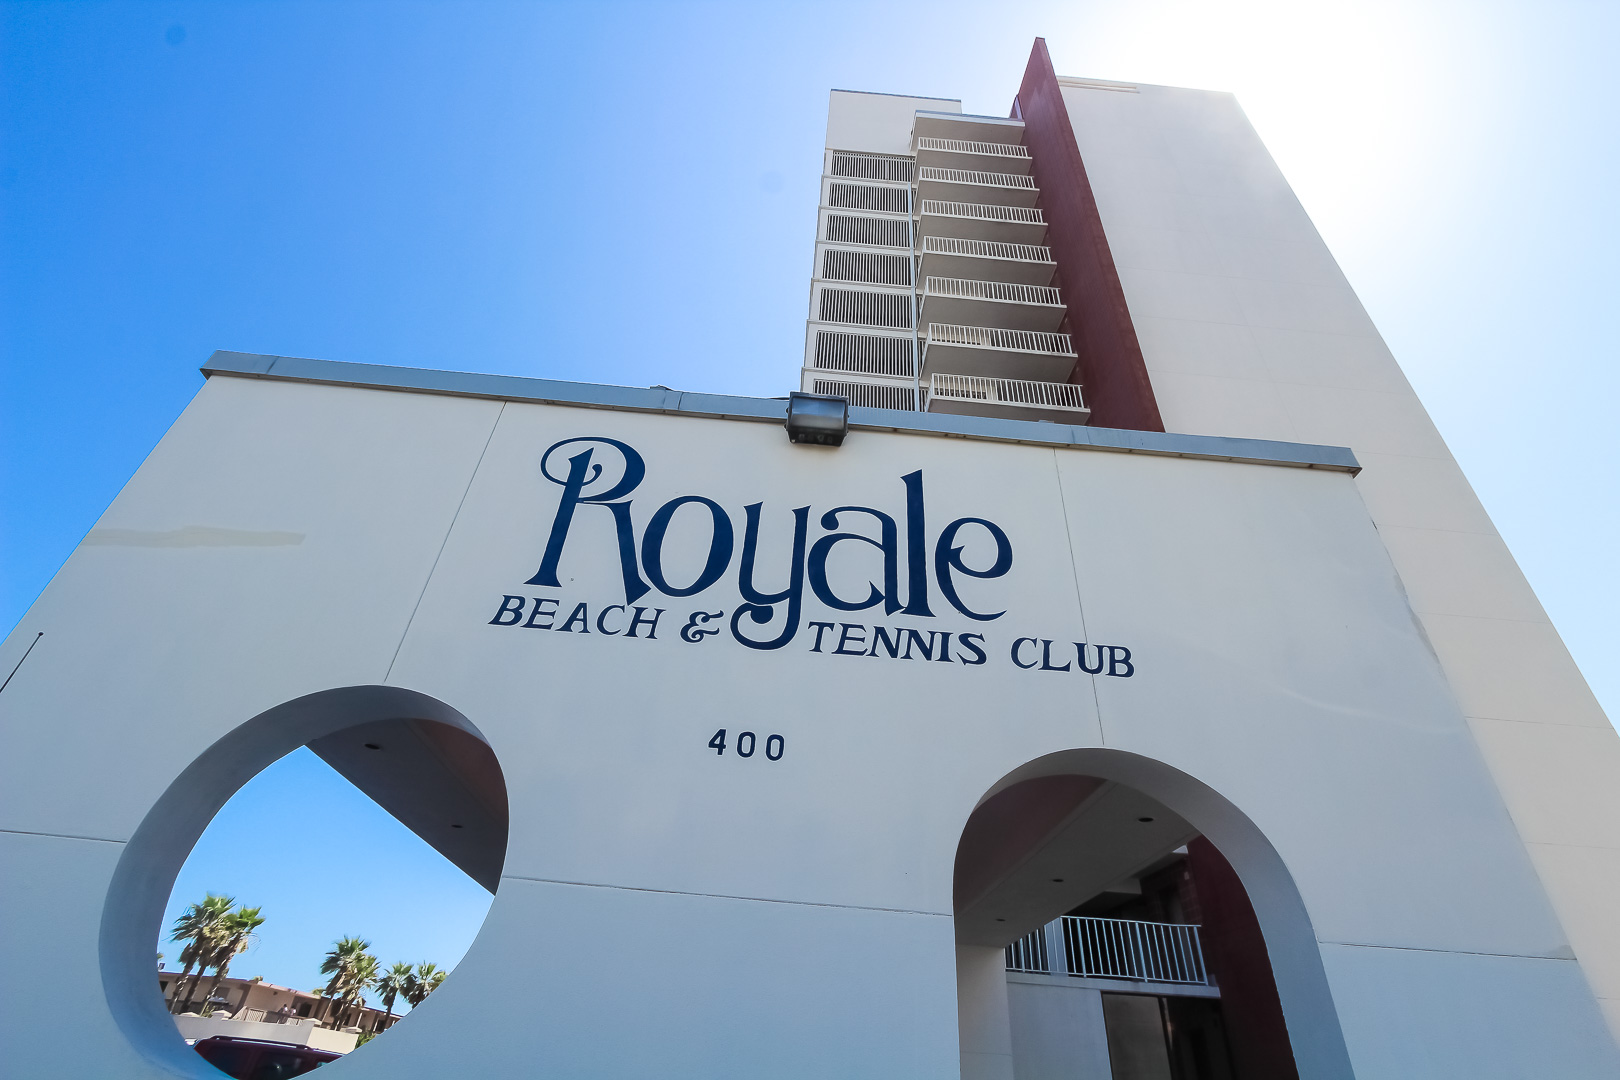 Resort signage at VRI's Royale Beach Tennis Club in Texas.